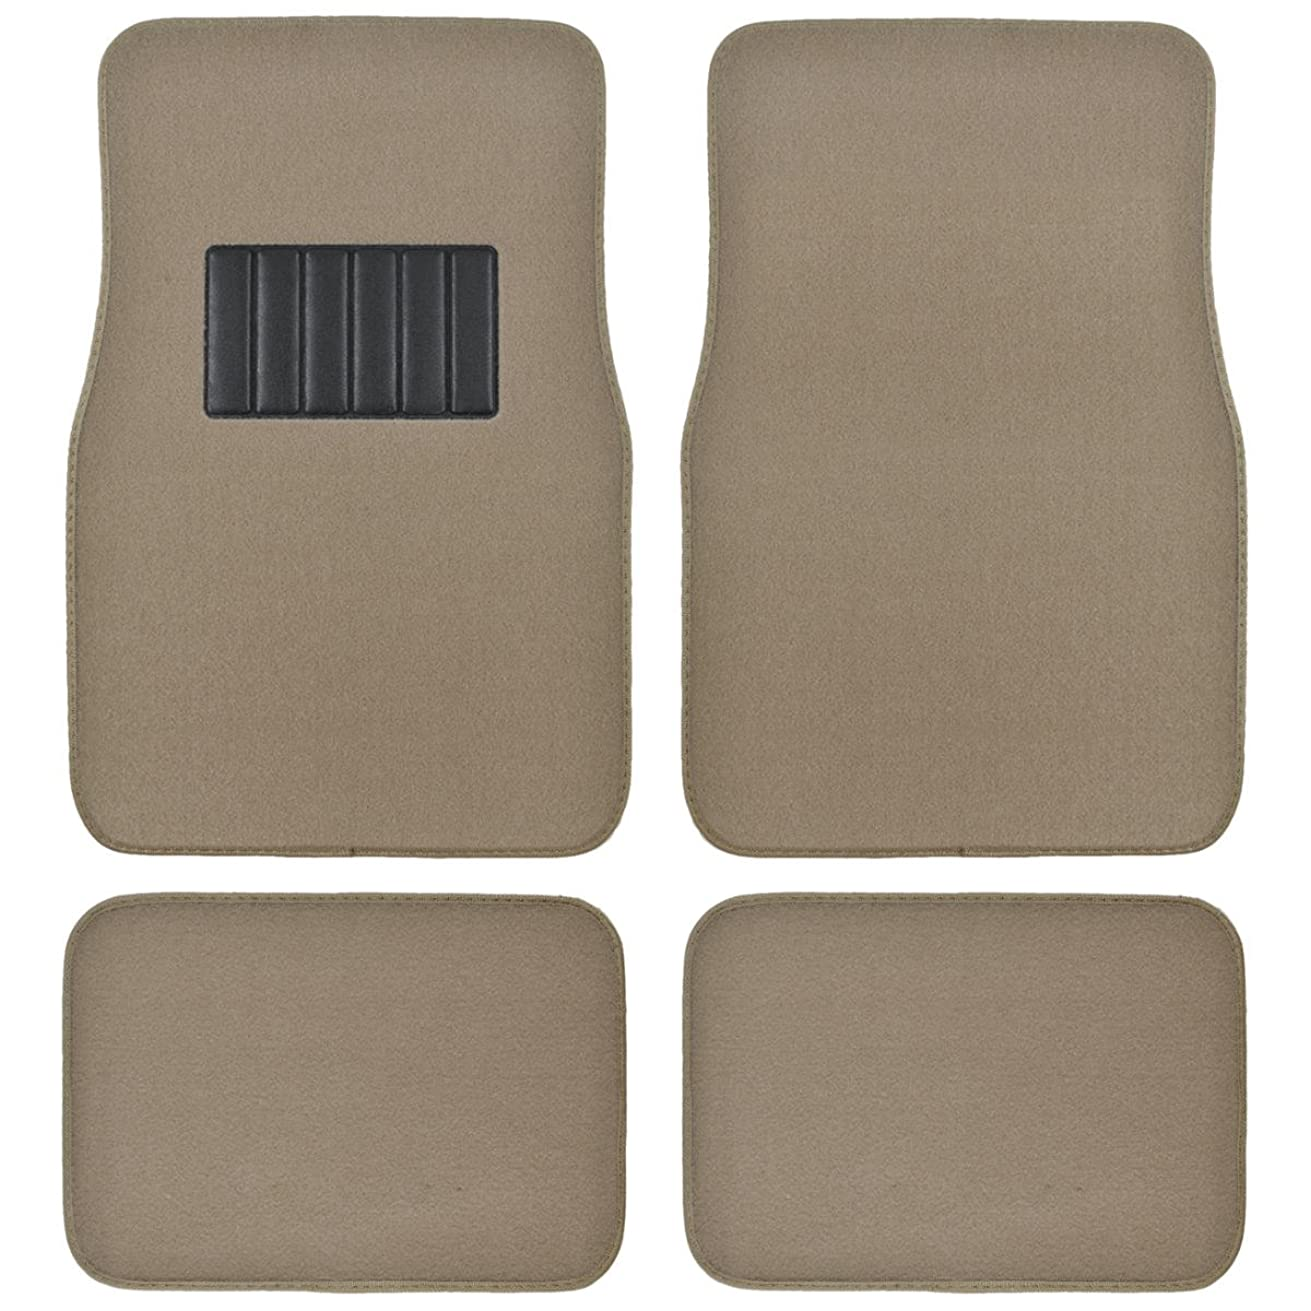 BDK Classic Carpet Floor Mats for Car & Auto - Universal Fit -Front & Rear with  Heelpad (Medium Beige)